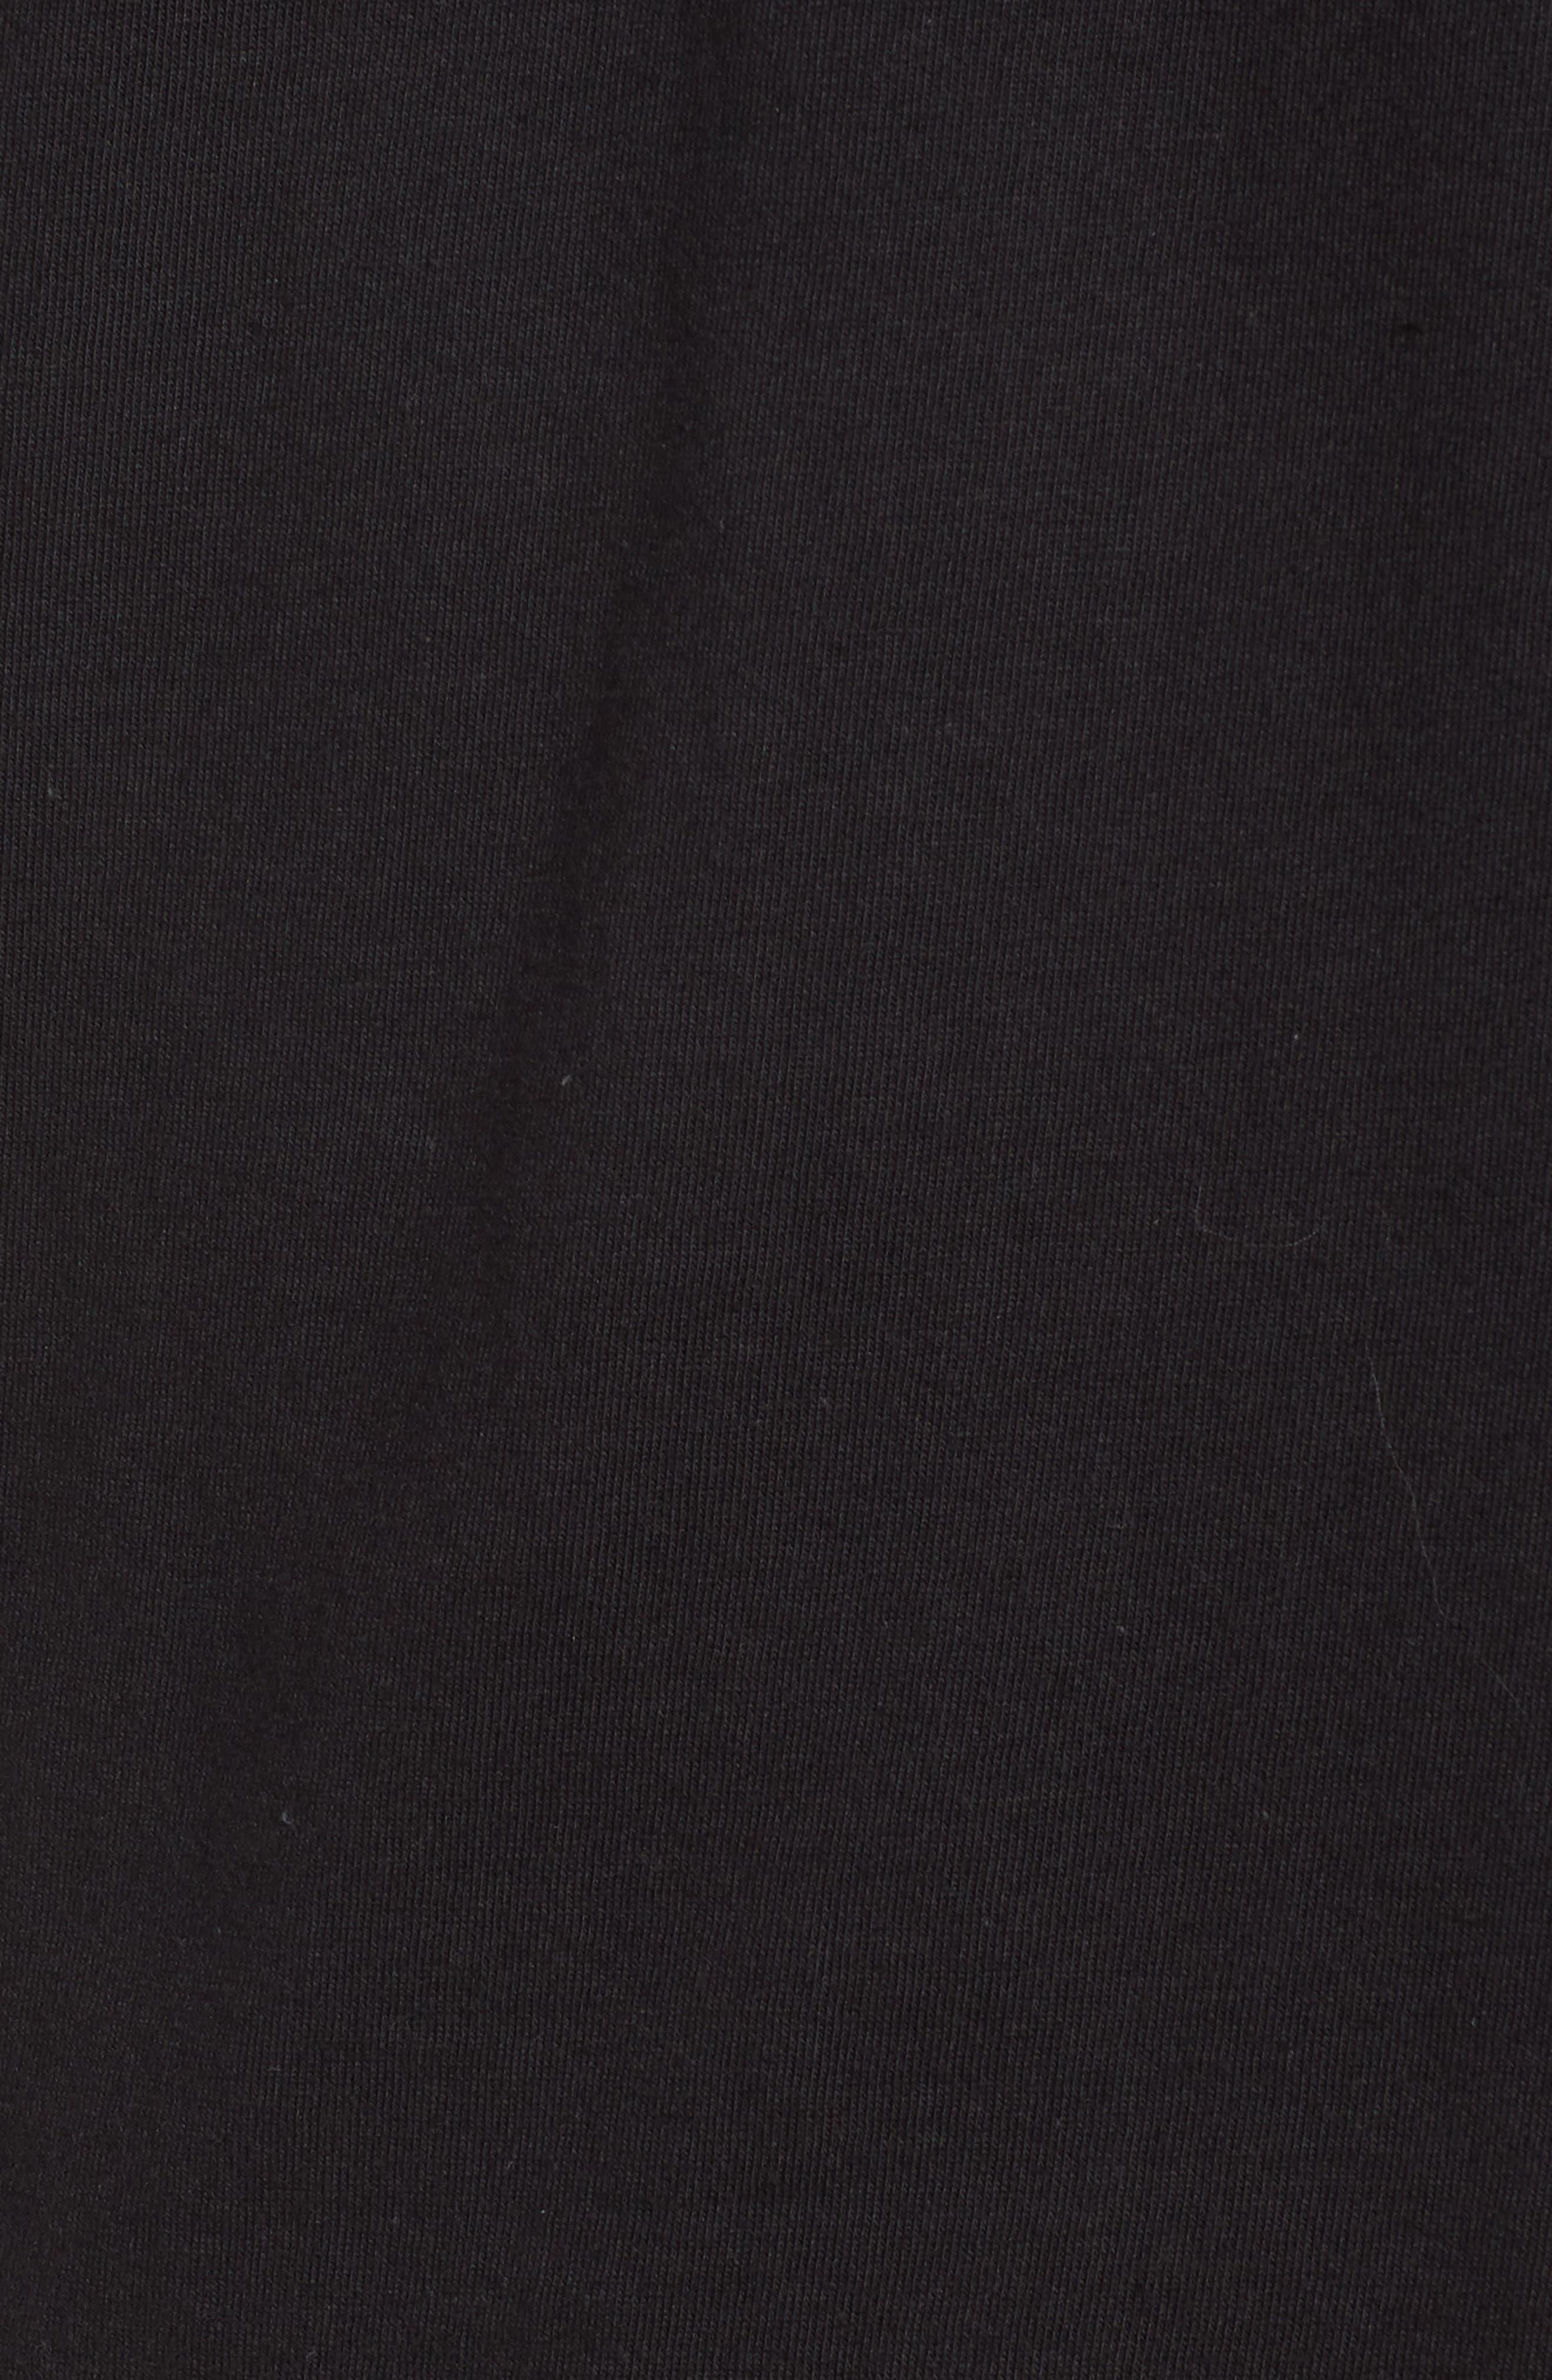 Swingers Saloon T-Shirt,                             Alternate thumbnail 5, color,                             Black